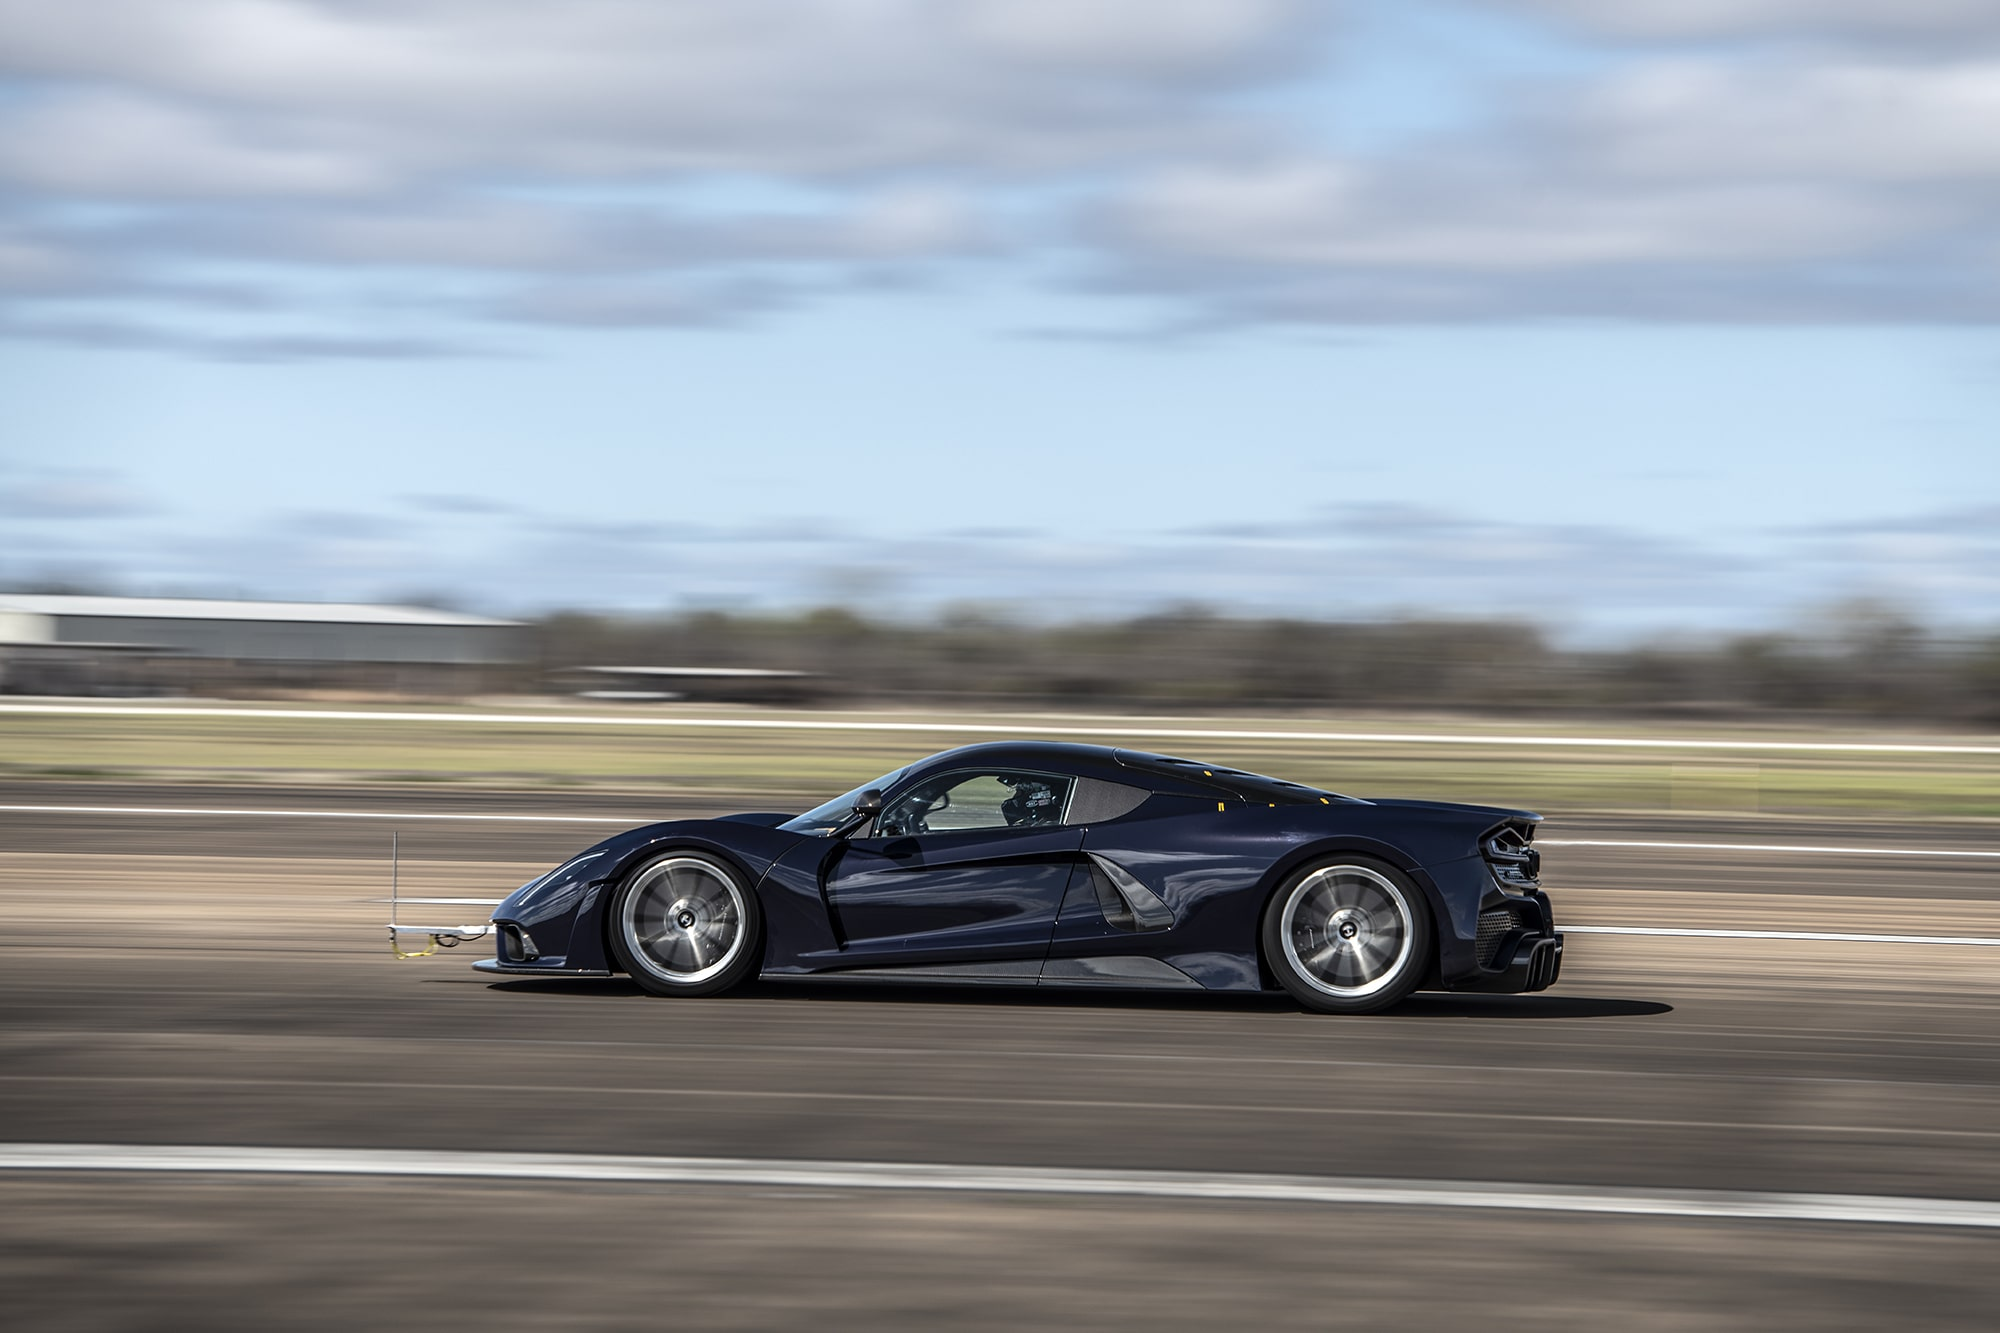 Hennessey Venom F5 Completes First Round of Aerodynamic Testing